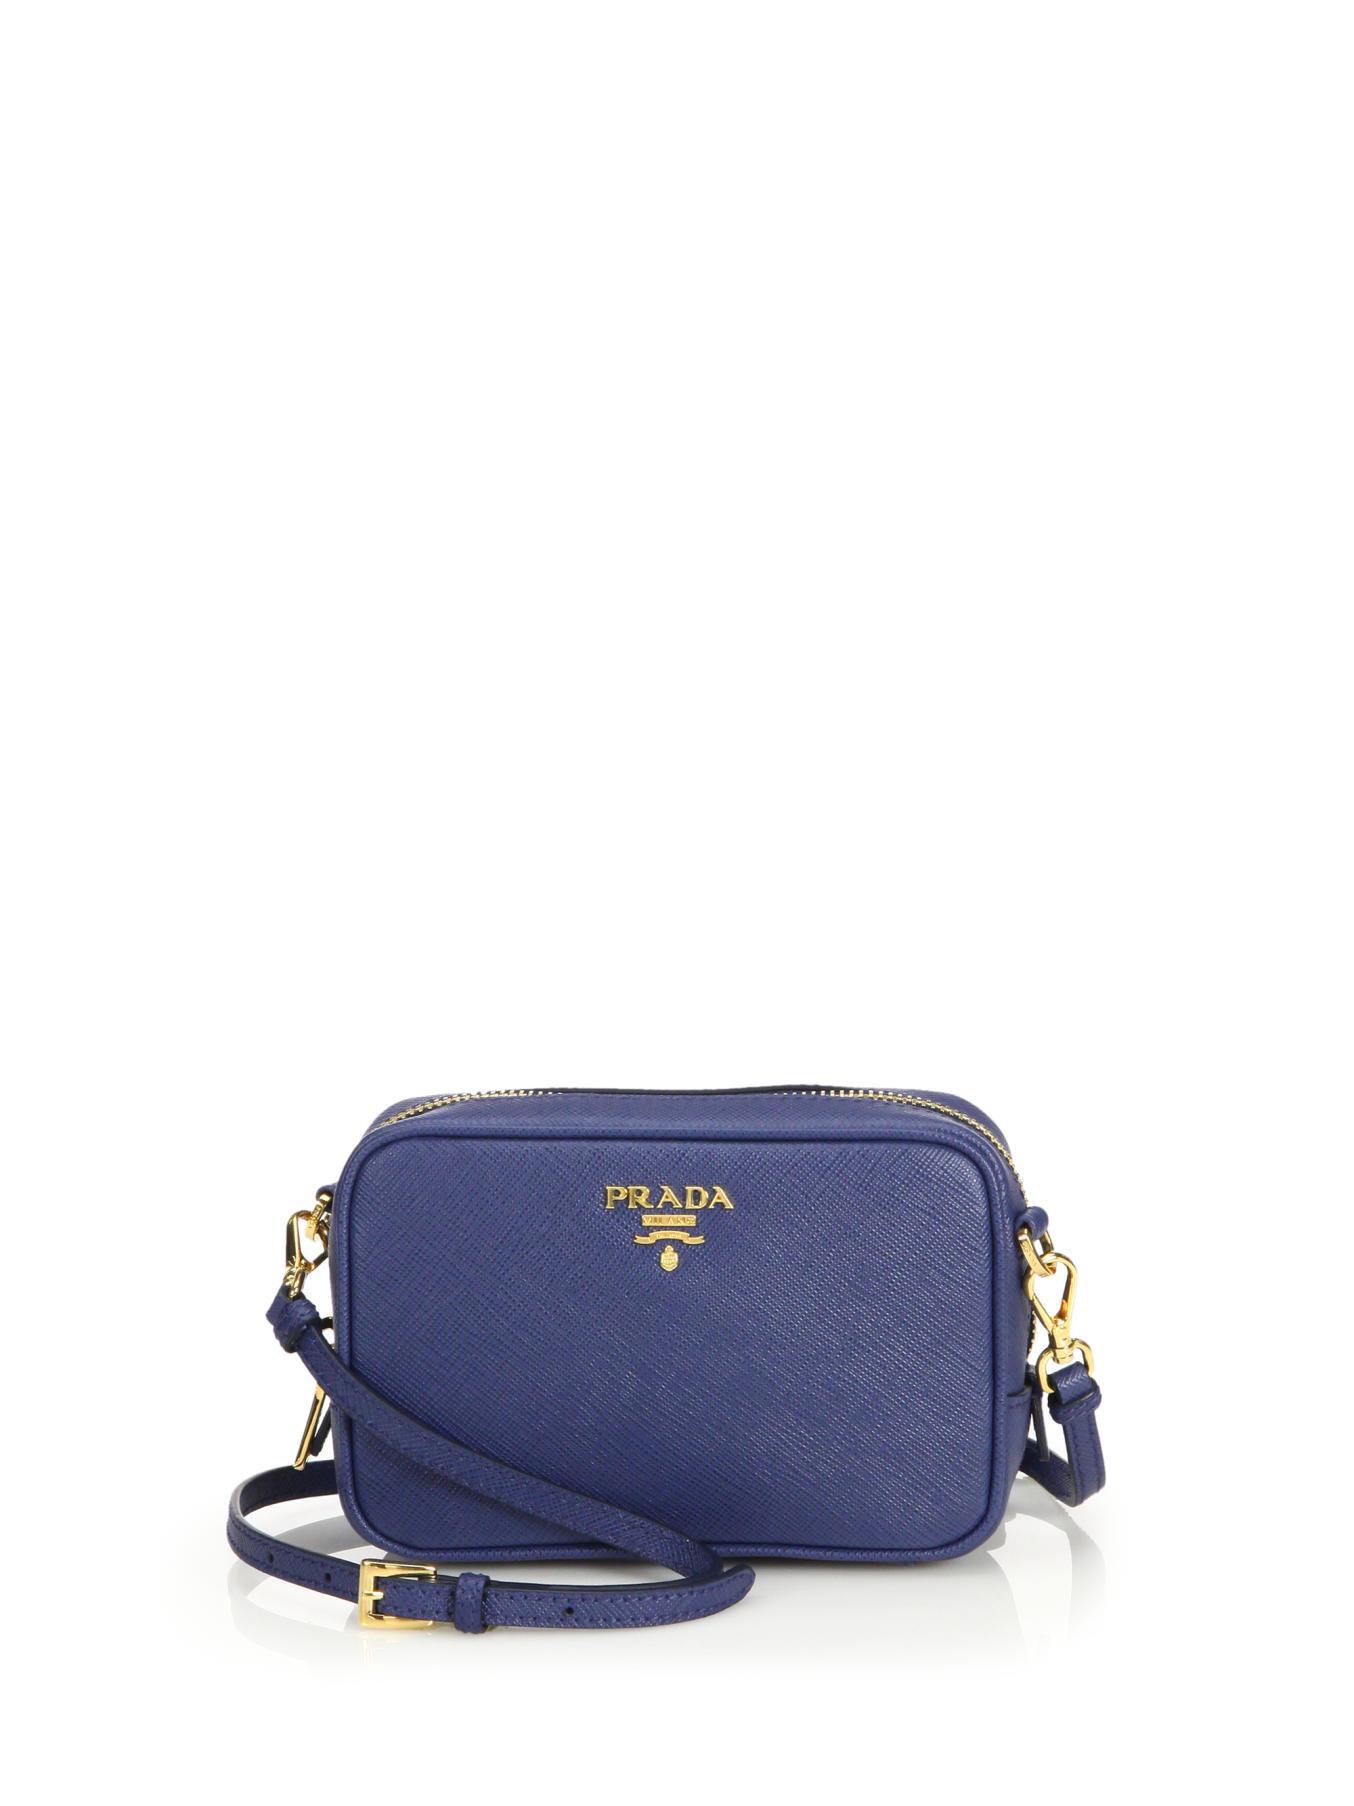 Prada Saffiano Leather Camera Bag in Blue | Lyst